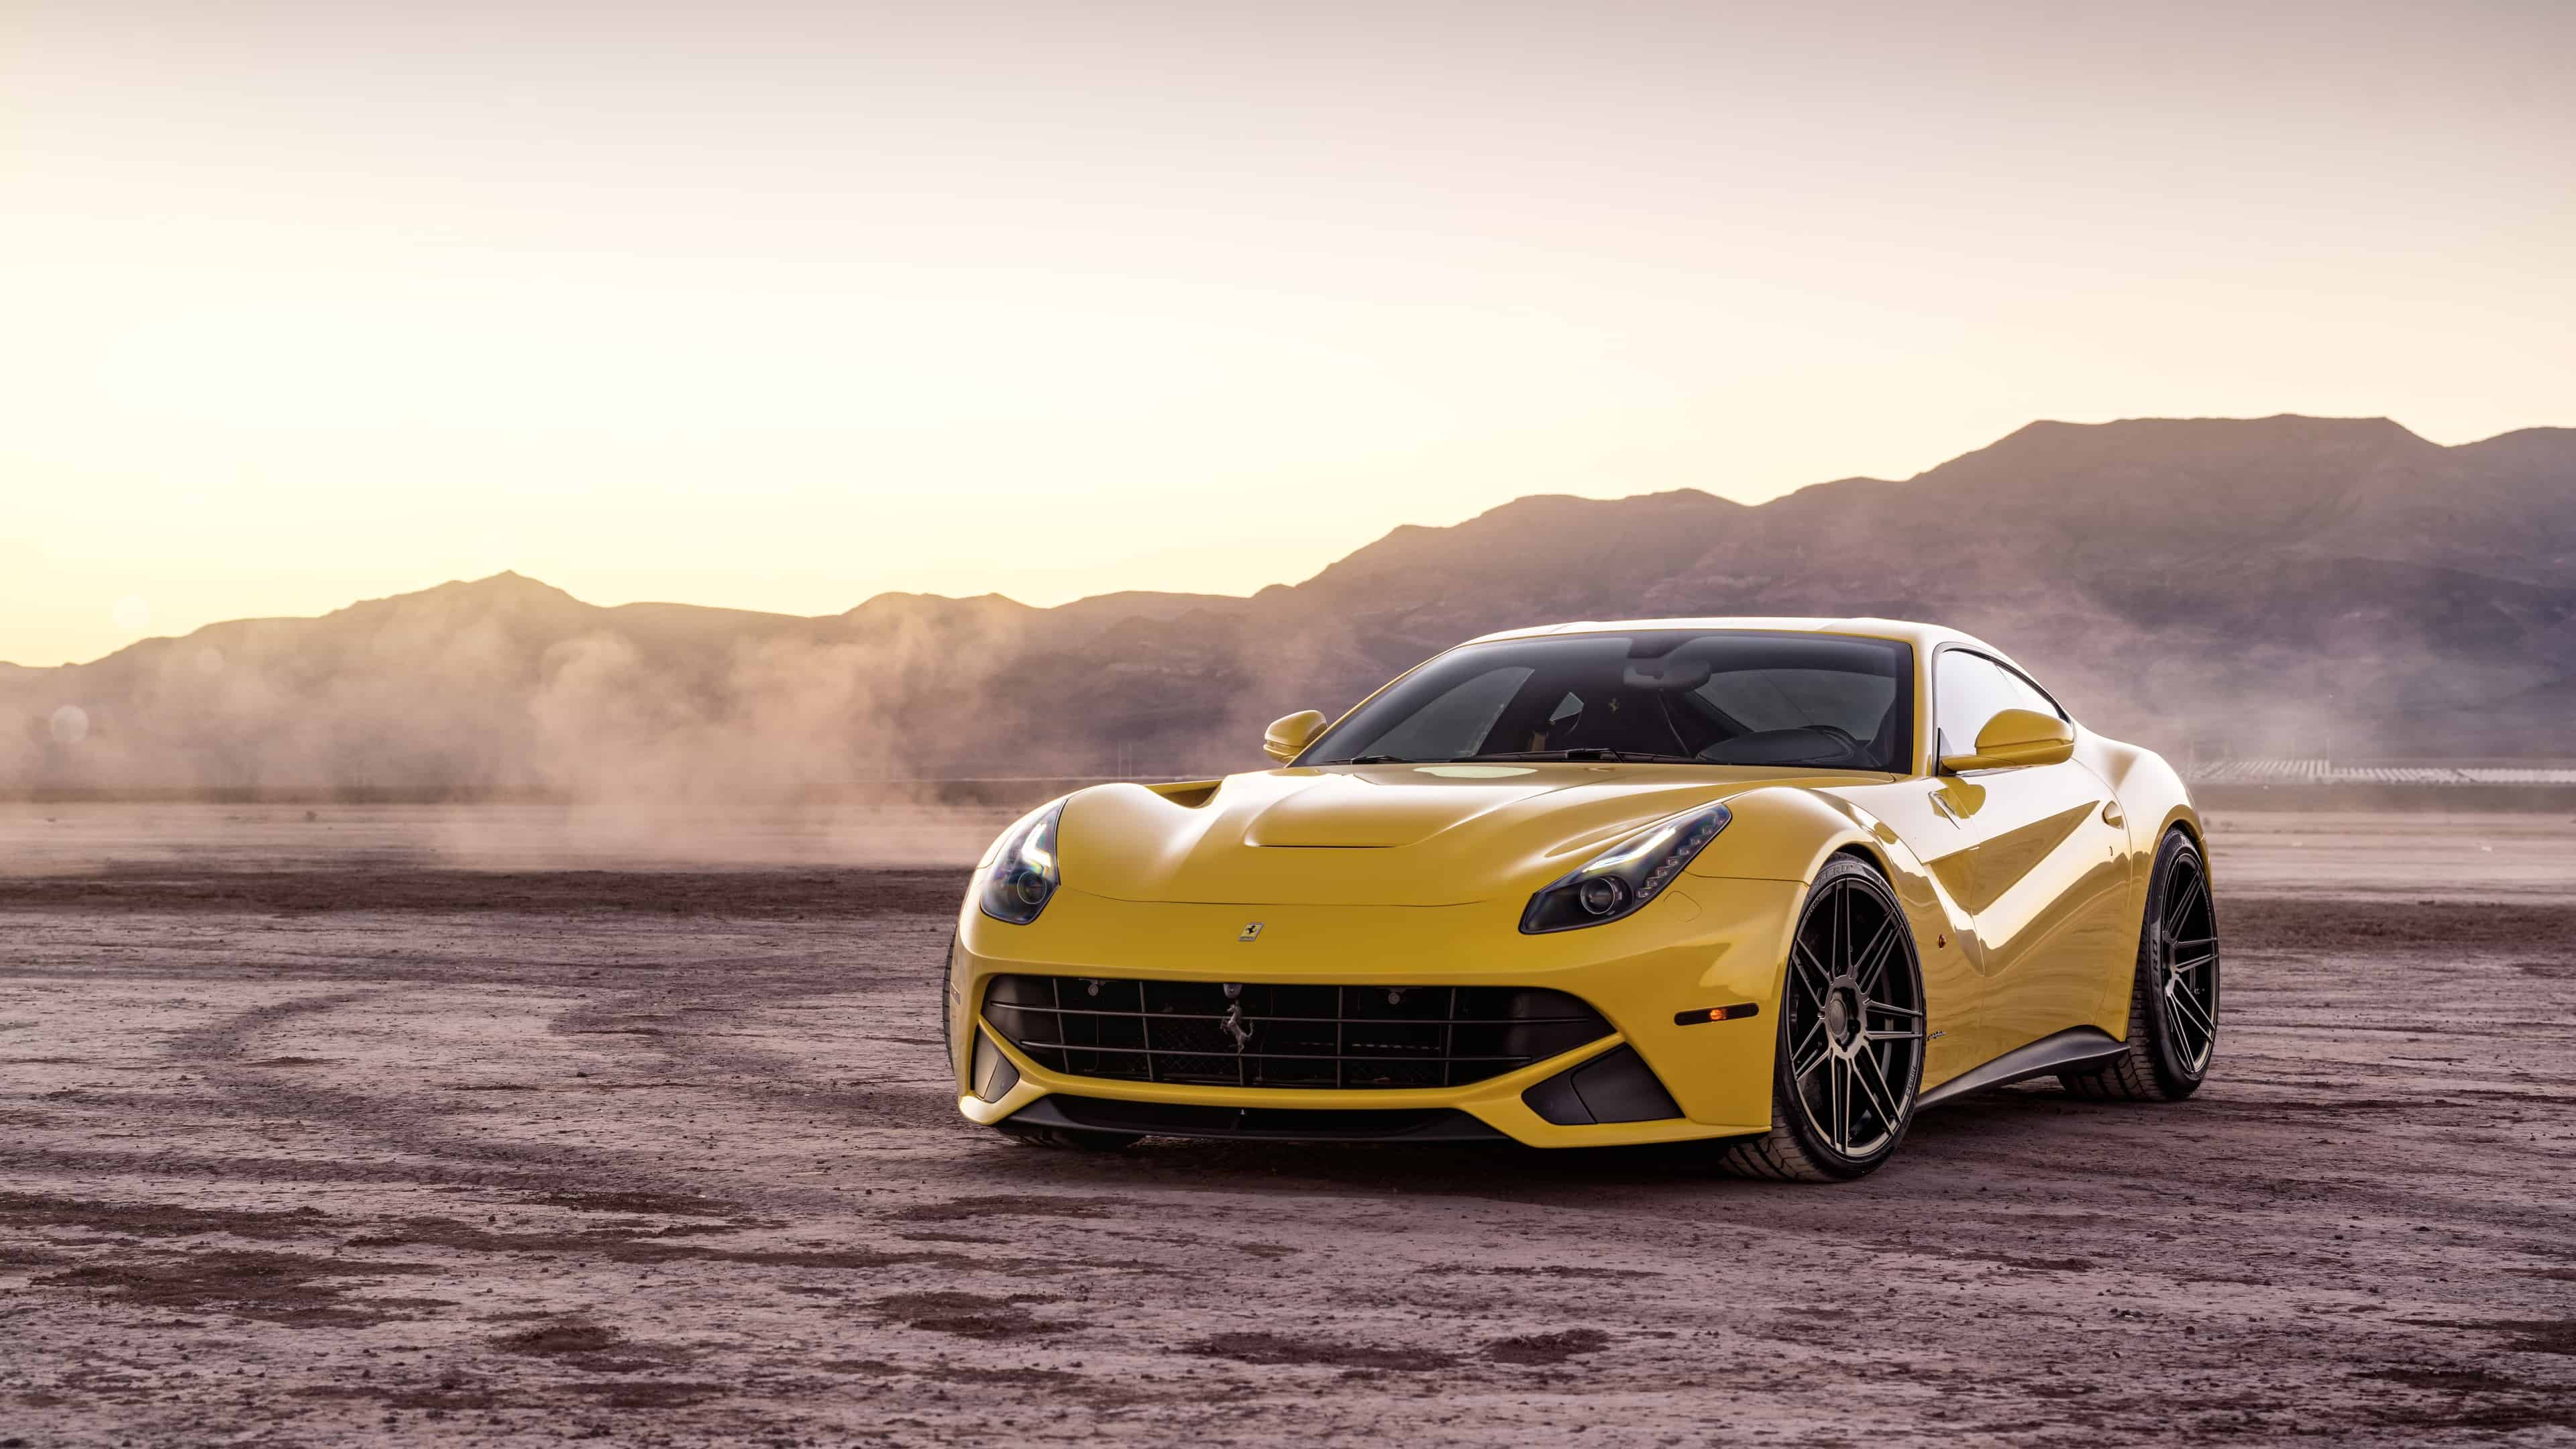 24+ Wallpaper 4K Ferrari  Pictures